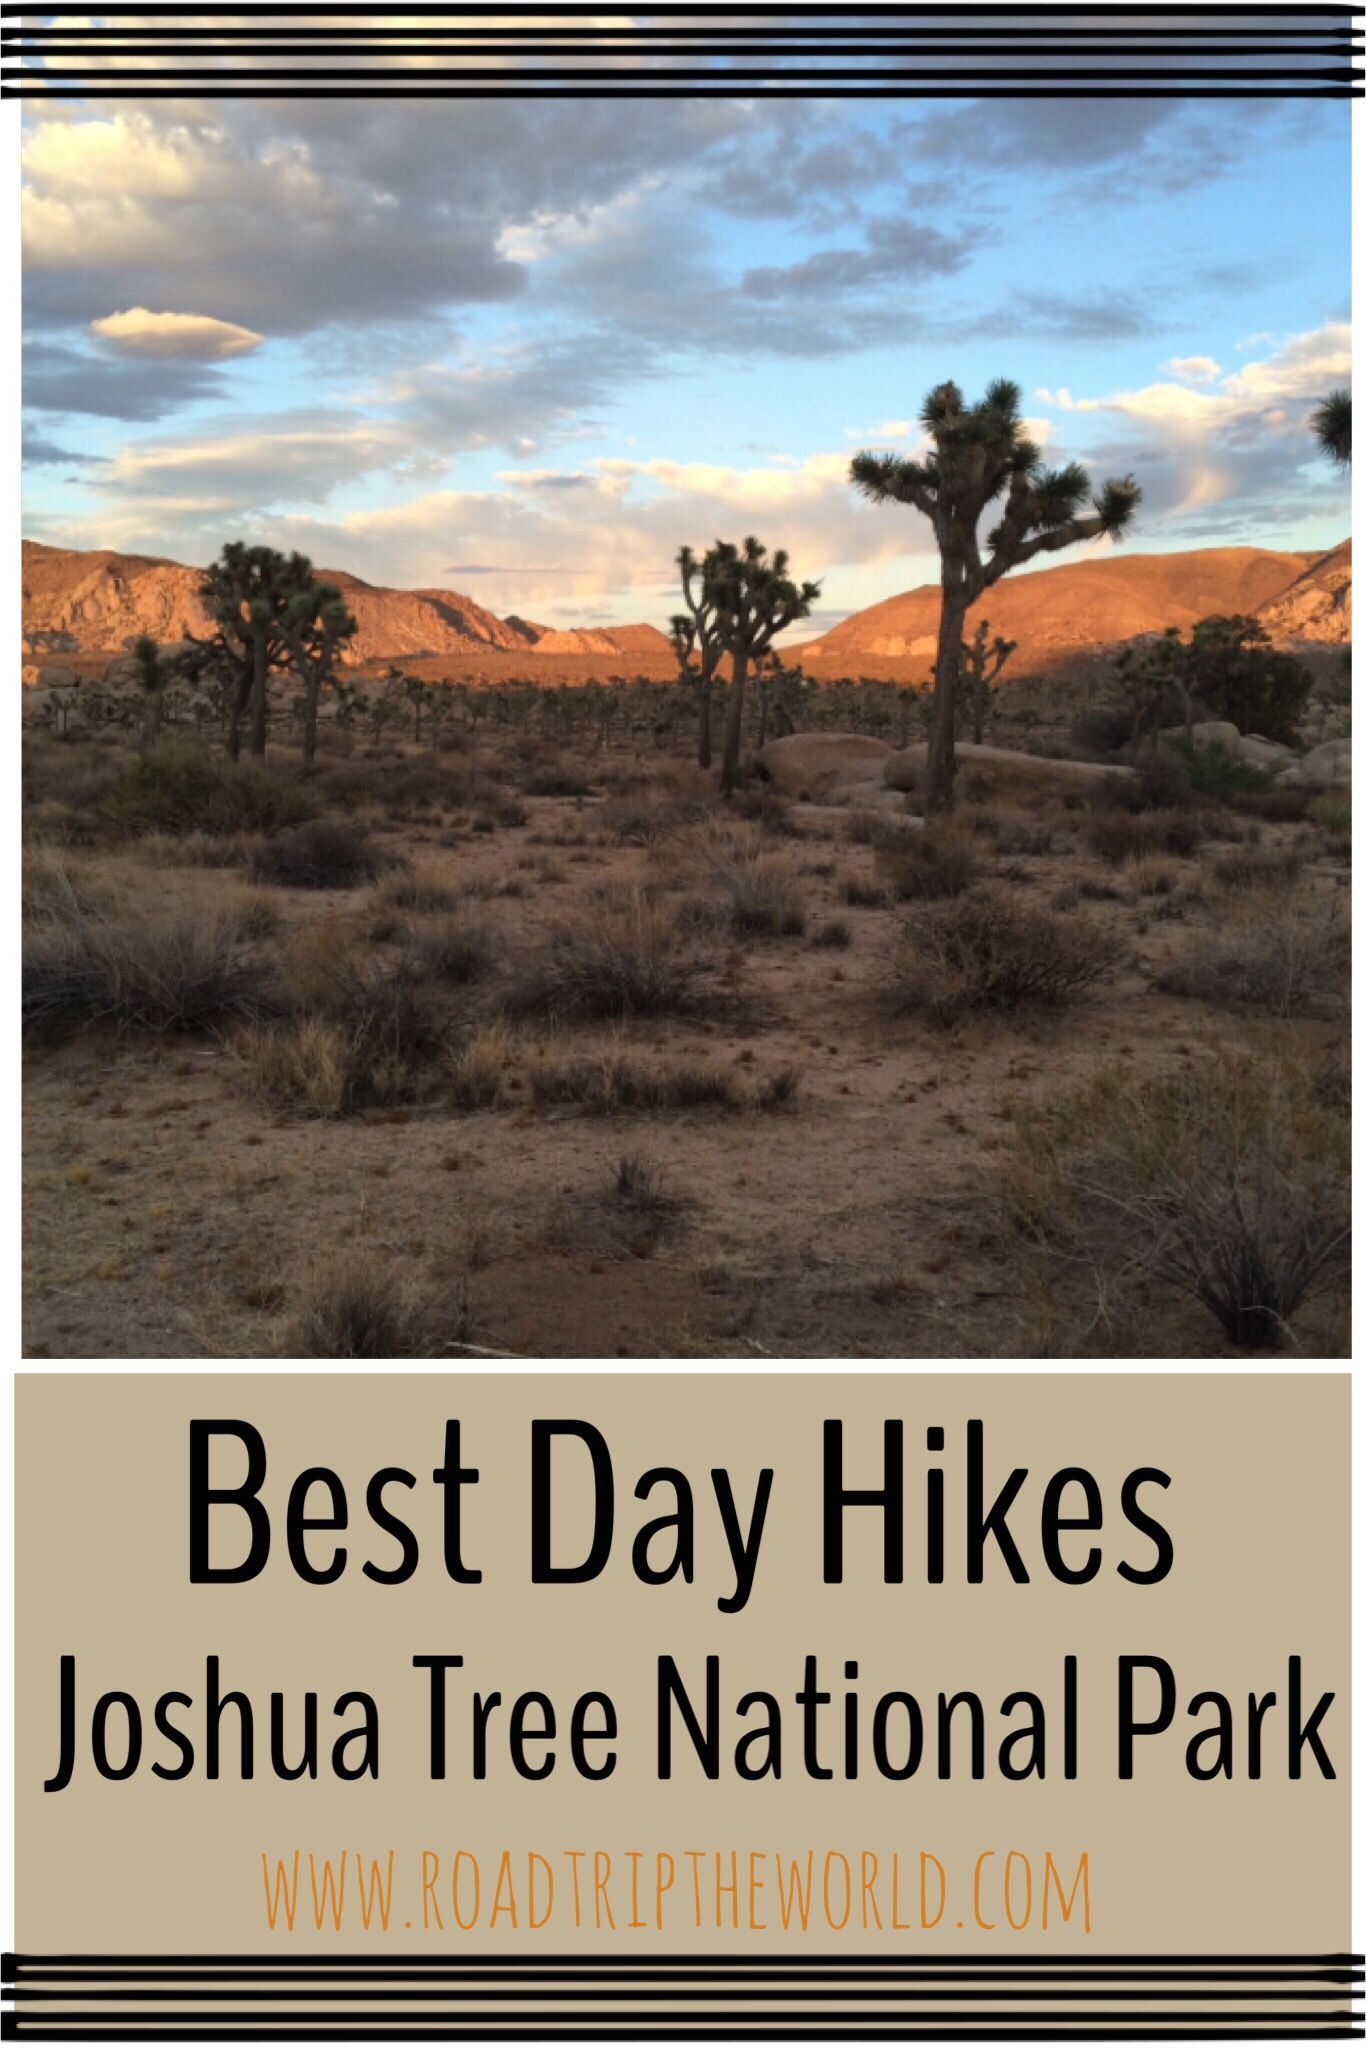 Best Day Hikes Joshua Tree National Park | Trees, Parks ...